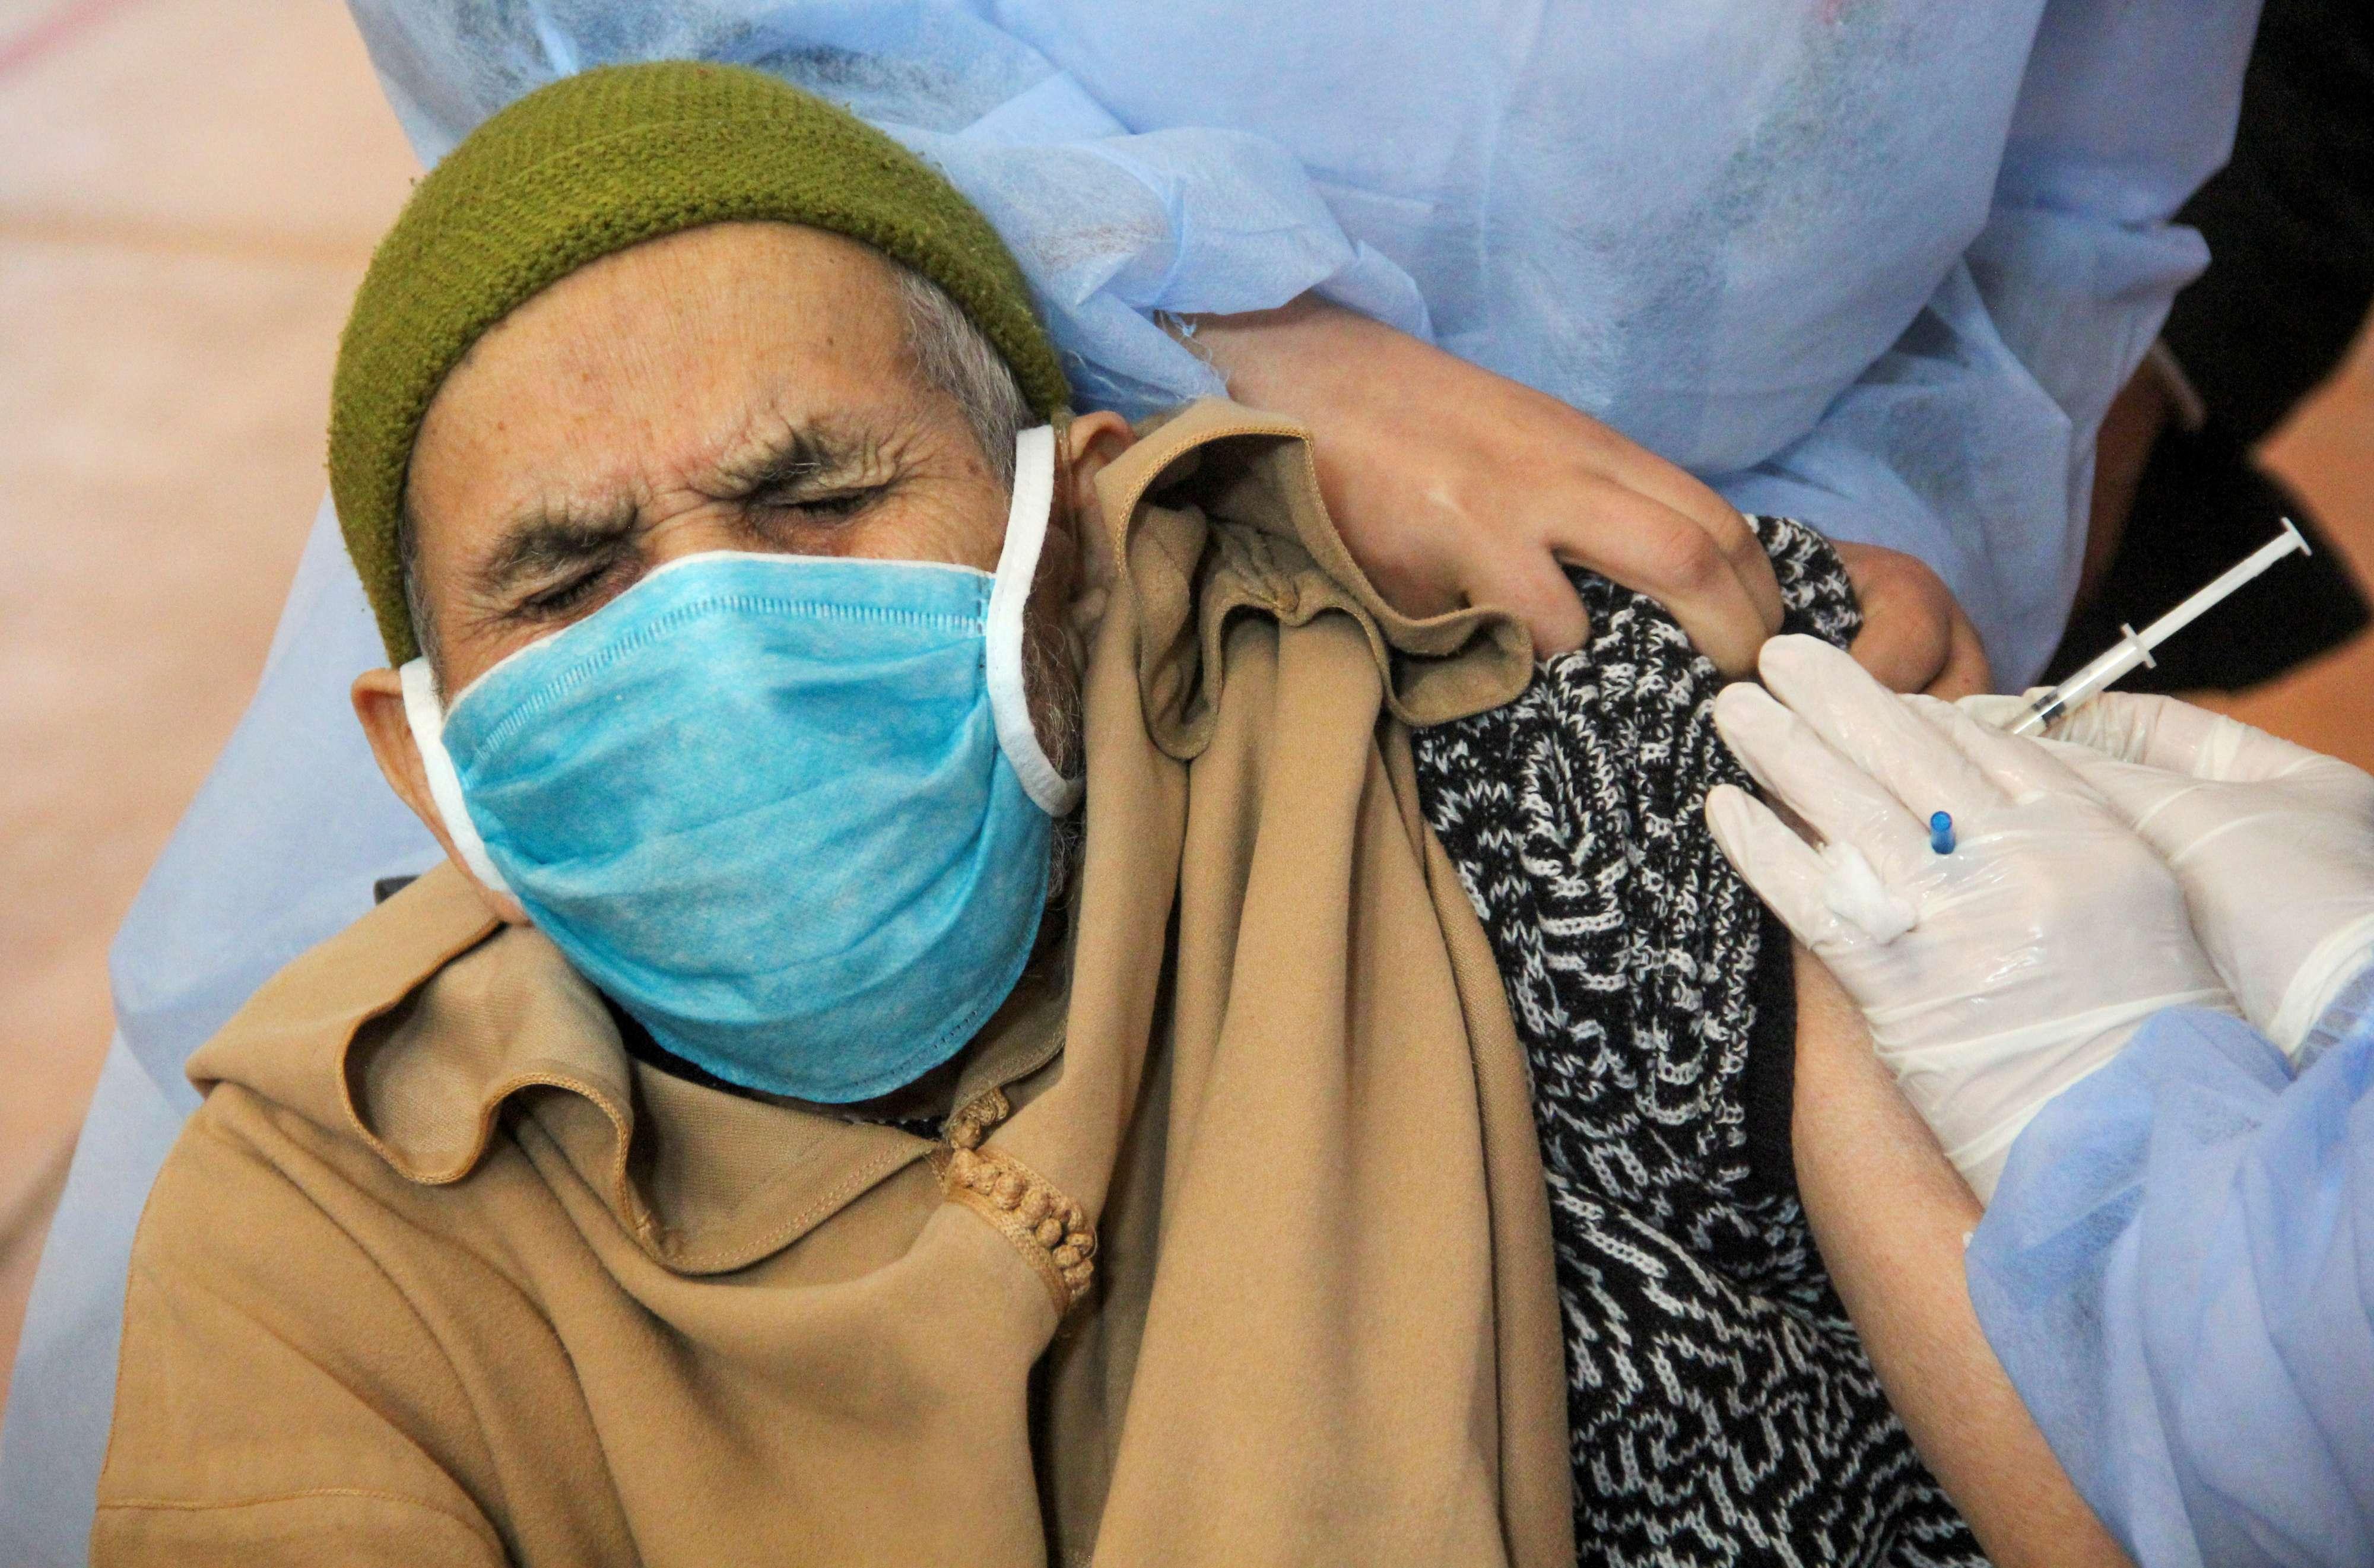 20210316151007reup--2021-03-16t150841z_621927454_rc2fcm9637hm_rtrmadp_3_health-coronavirus-morocco-migrants.h